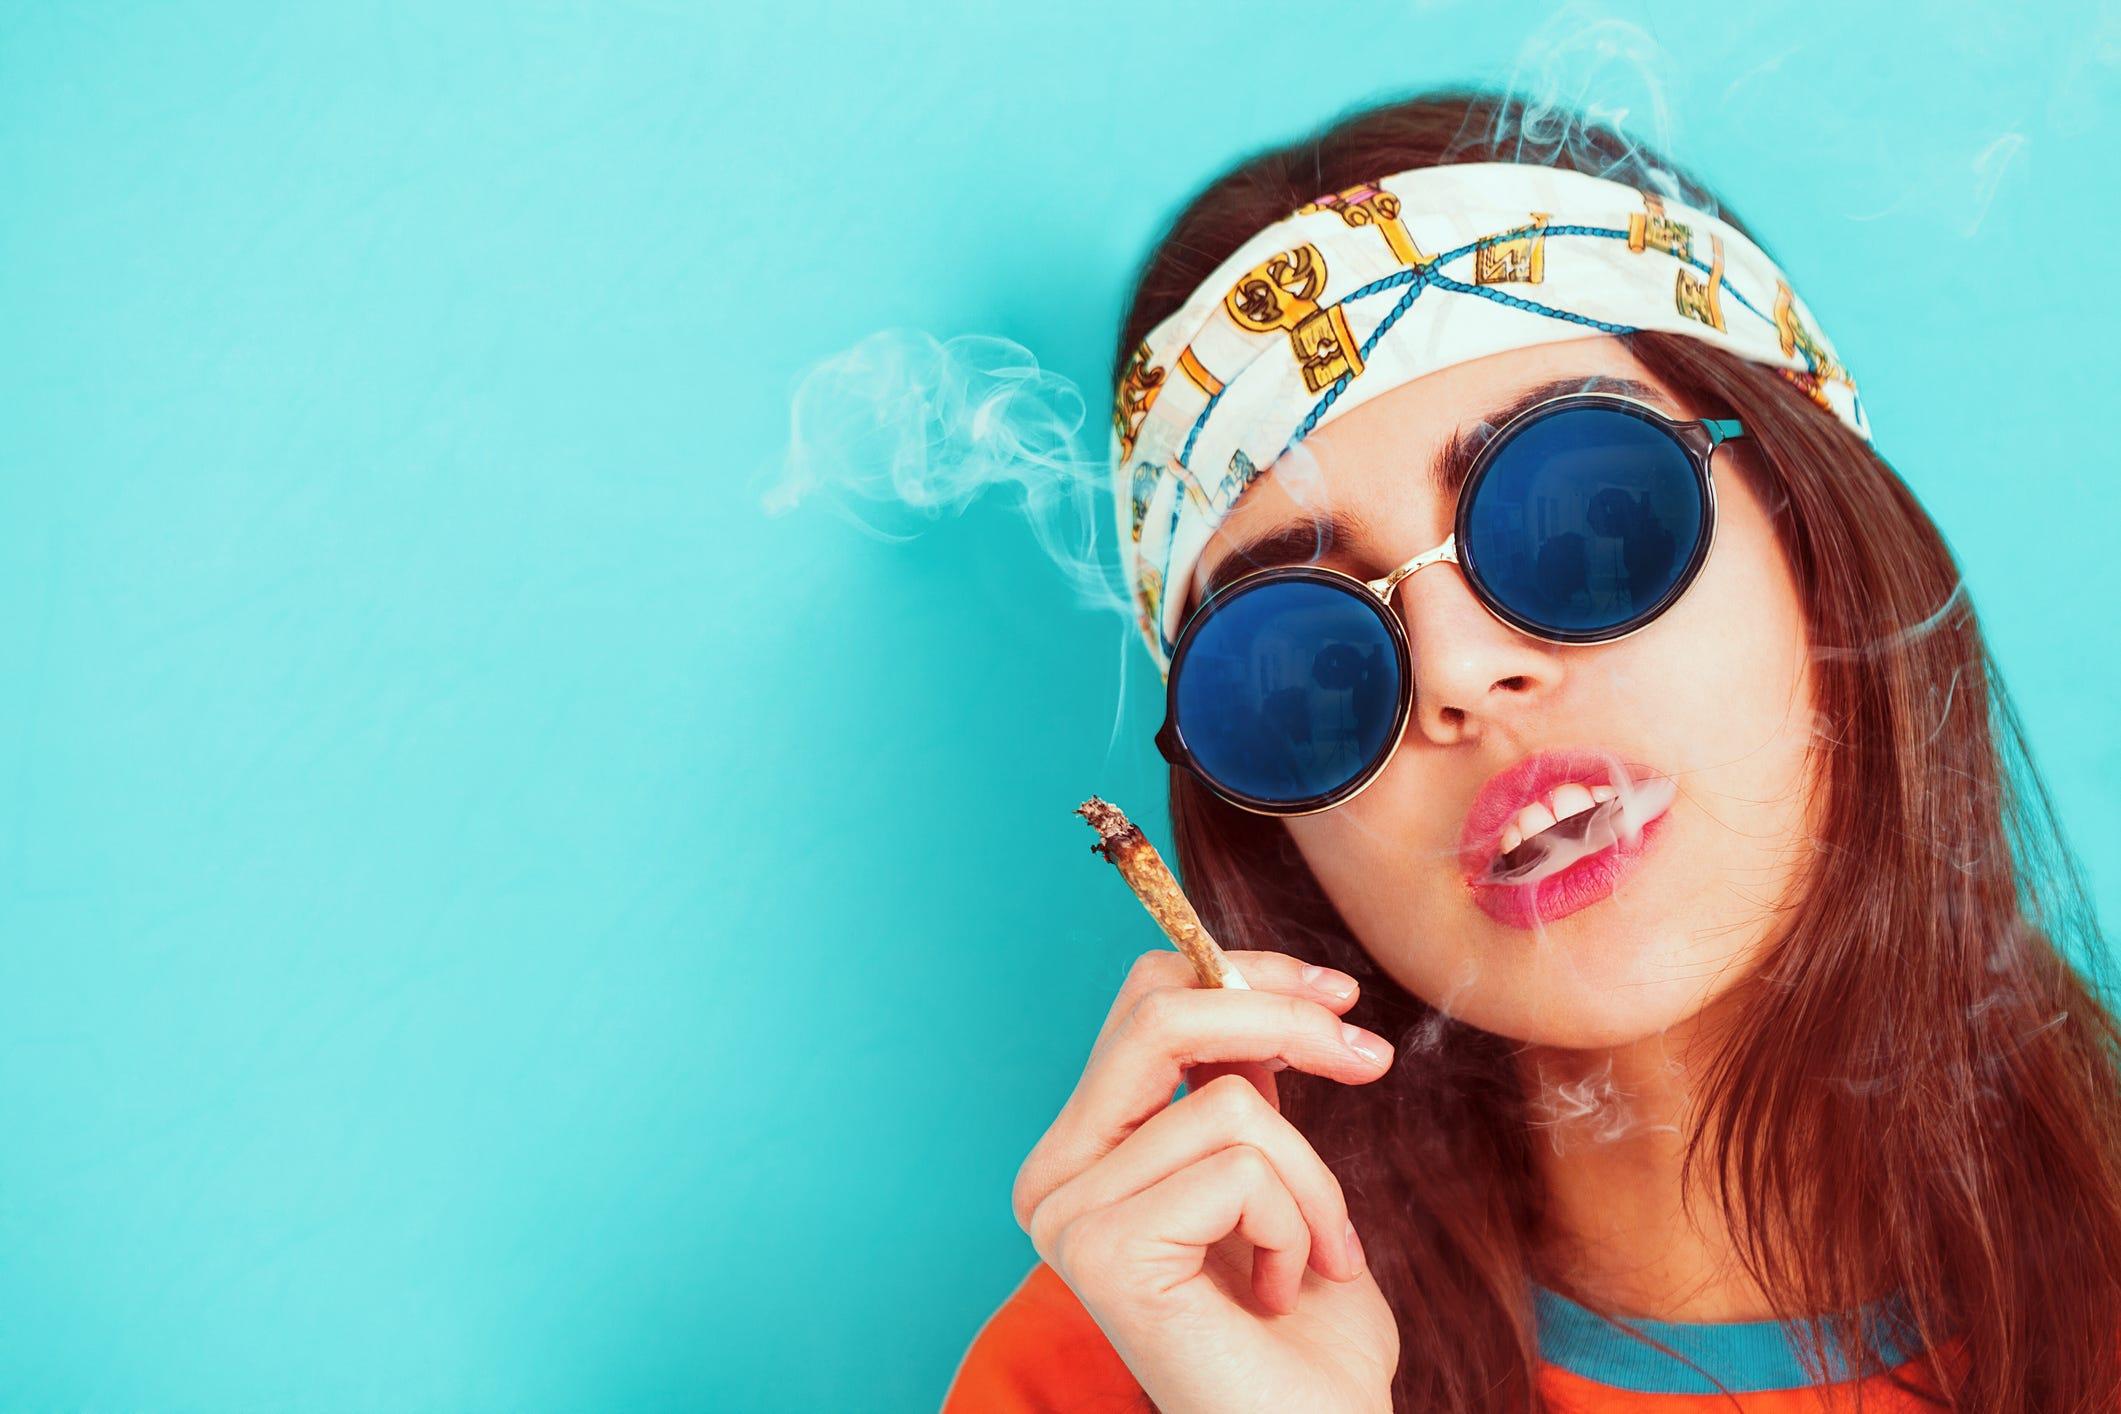 Everyday Weed Someone Hookup Smokes Who